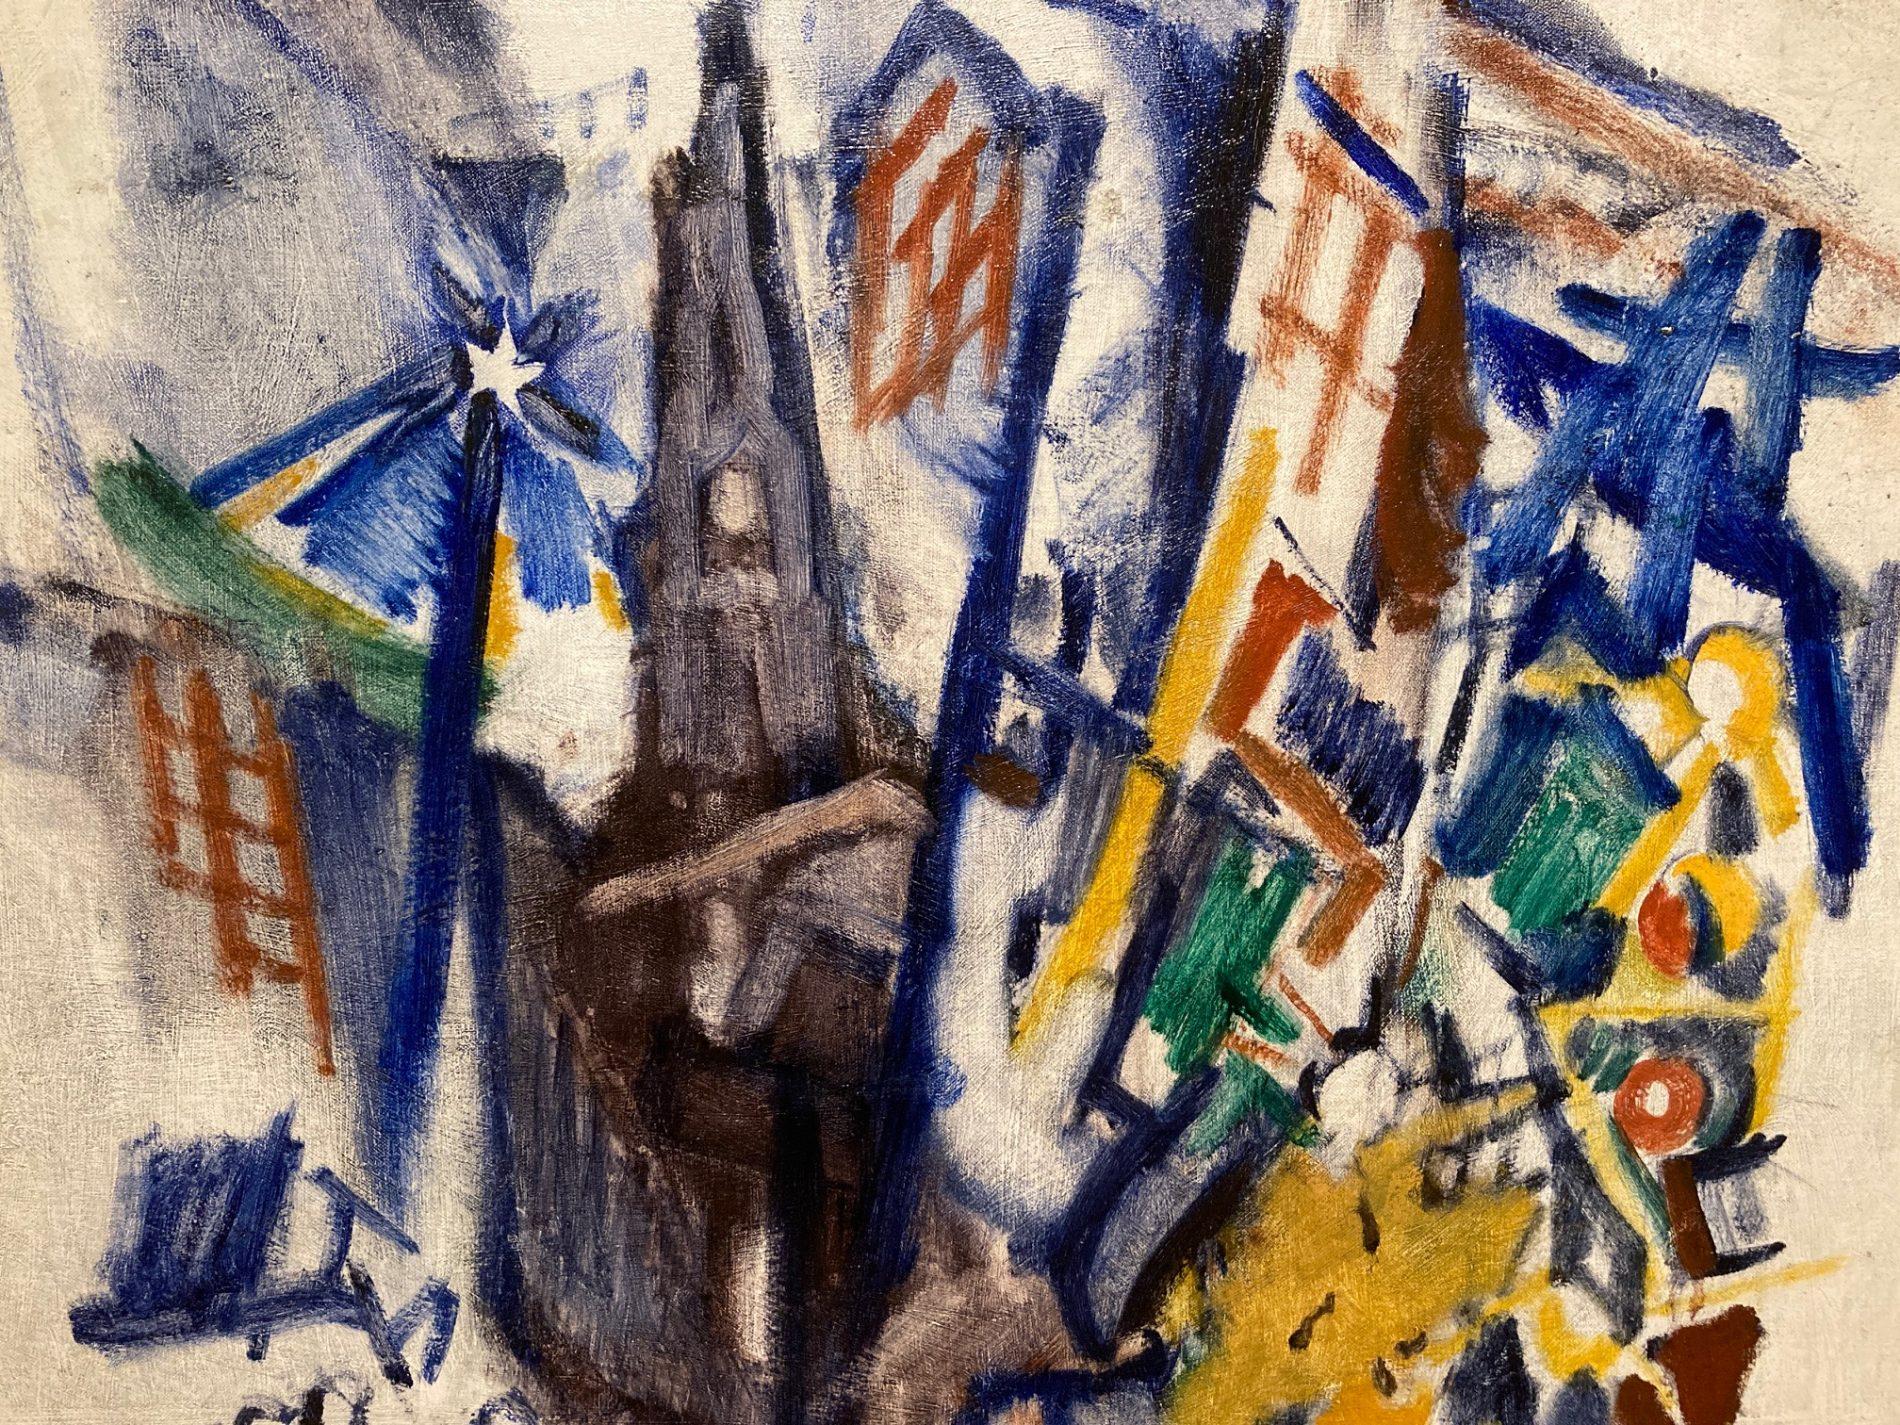 John Marin, Related to St. Paul's, New York, 1928, part of Cummer Museum Modern art collection